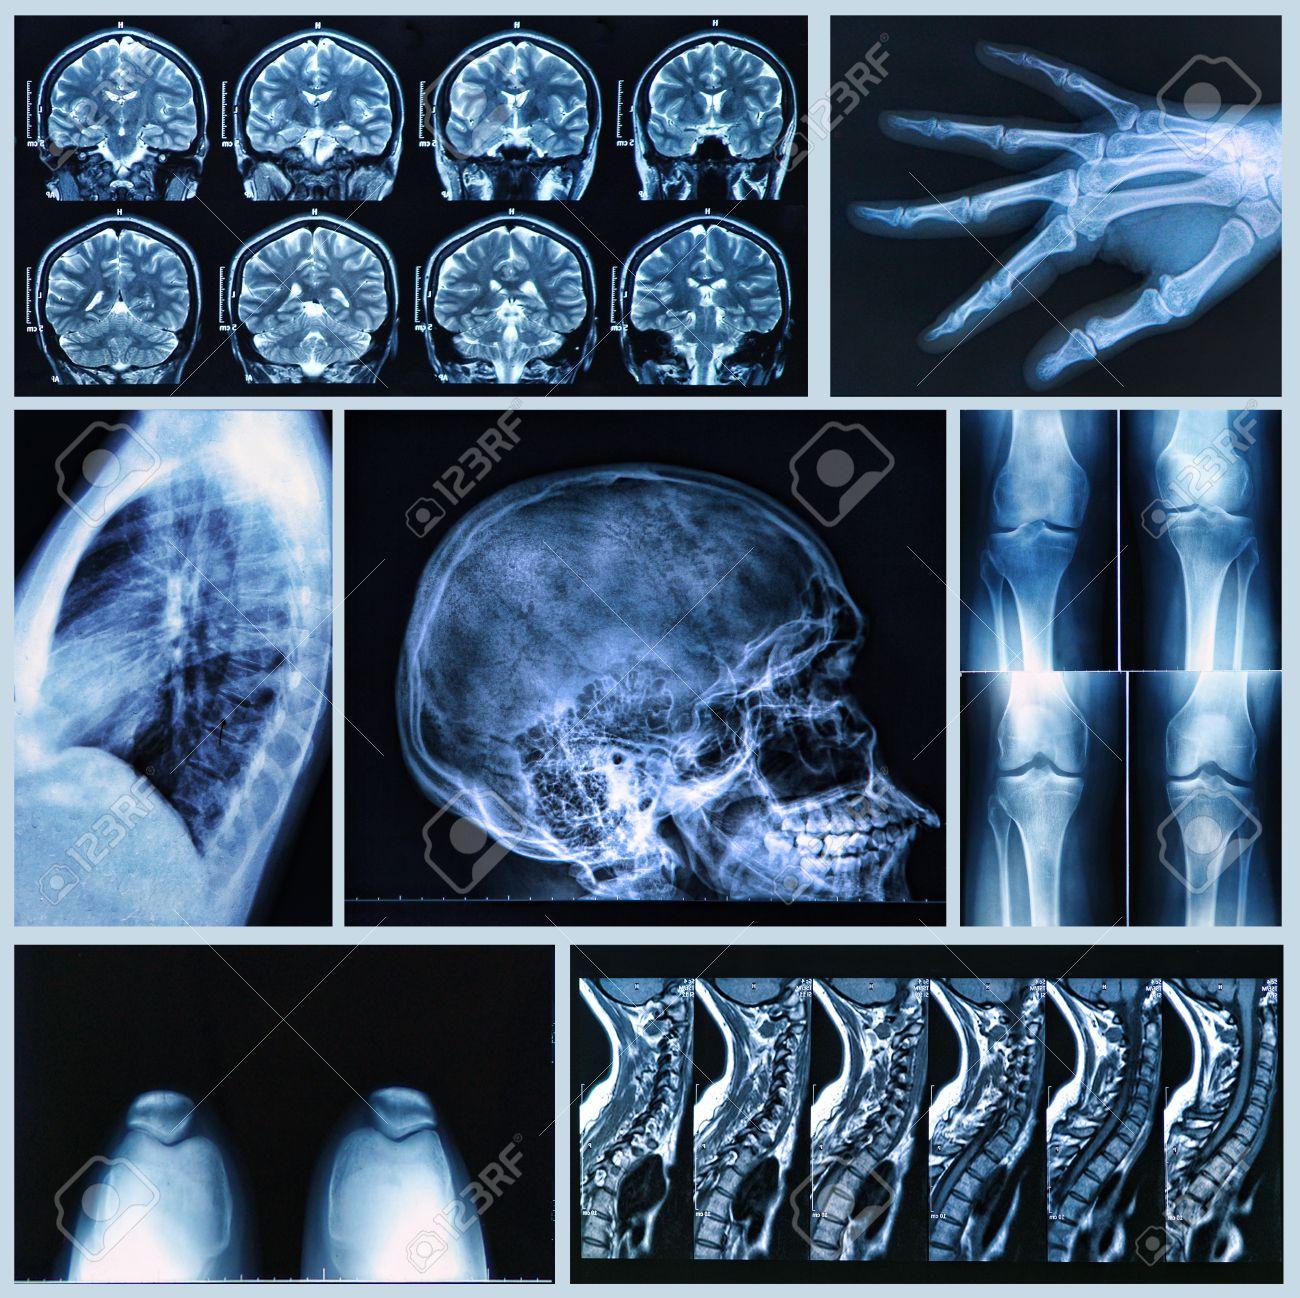 Radiography of Human Bones: x-ray and MRI scans Stock Photo - 24565060